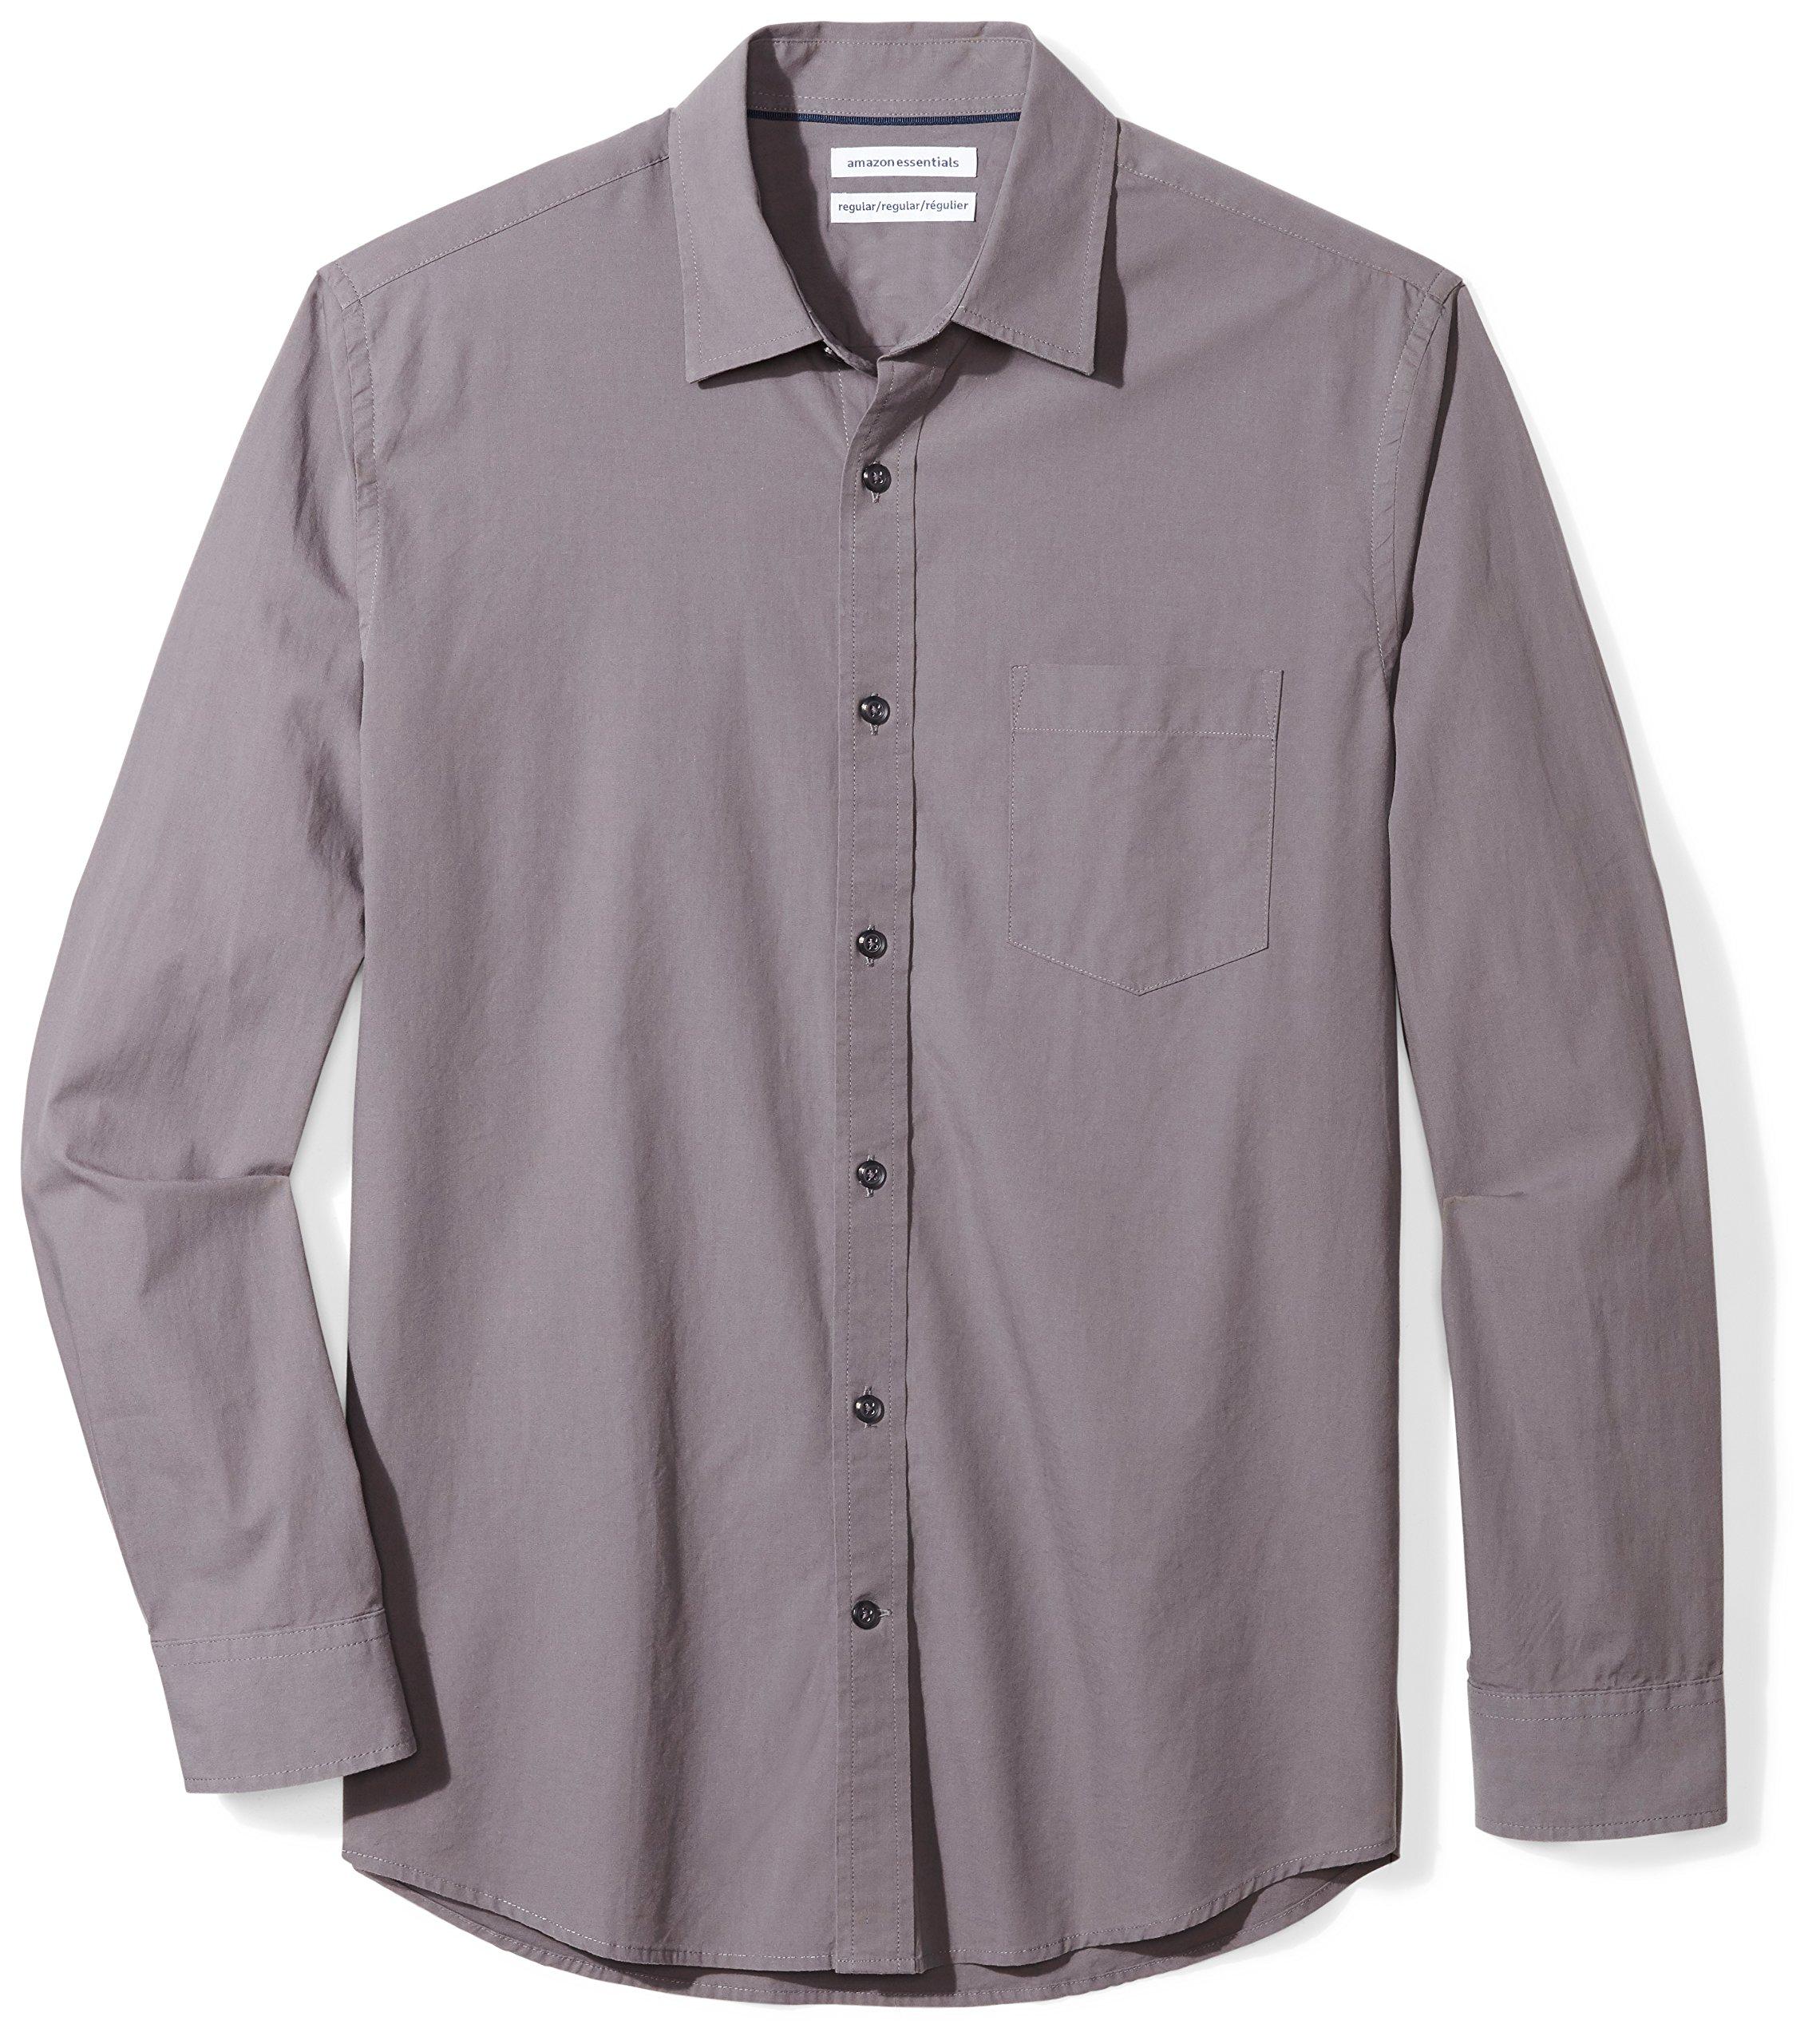 Amazon Essentials Men's Regular-Fit Long-Sleeve Solid Casual Poplin Shirt